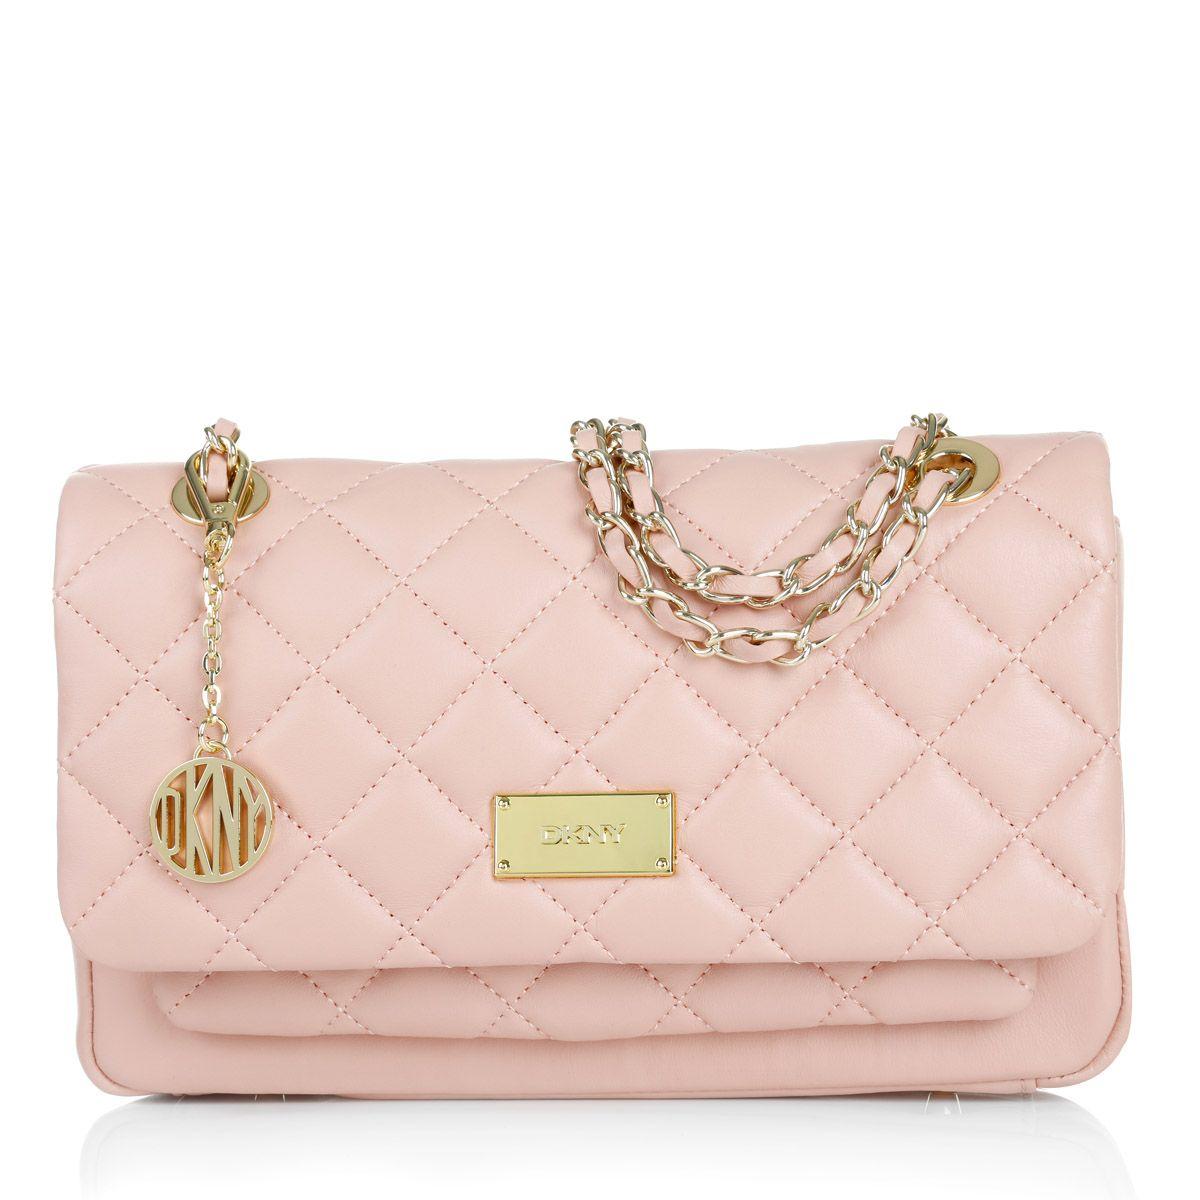 Gansevoort Quilted Nappa Crossbody Bag Pink